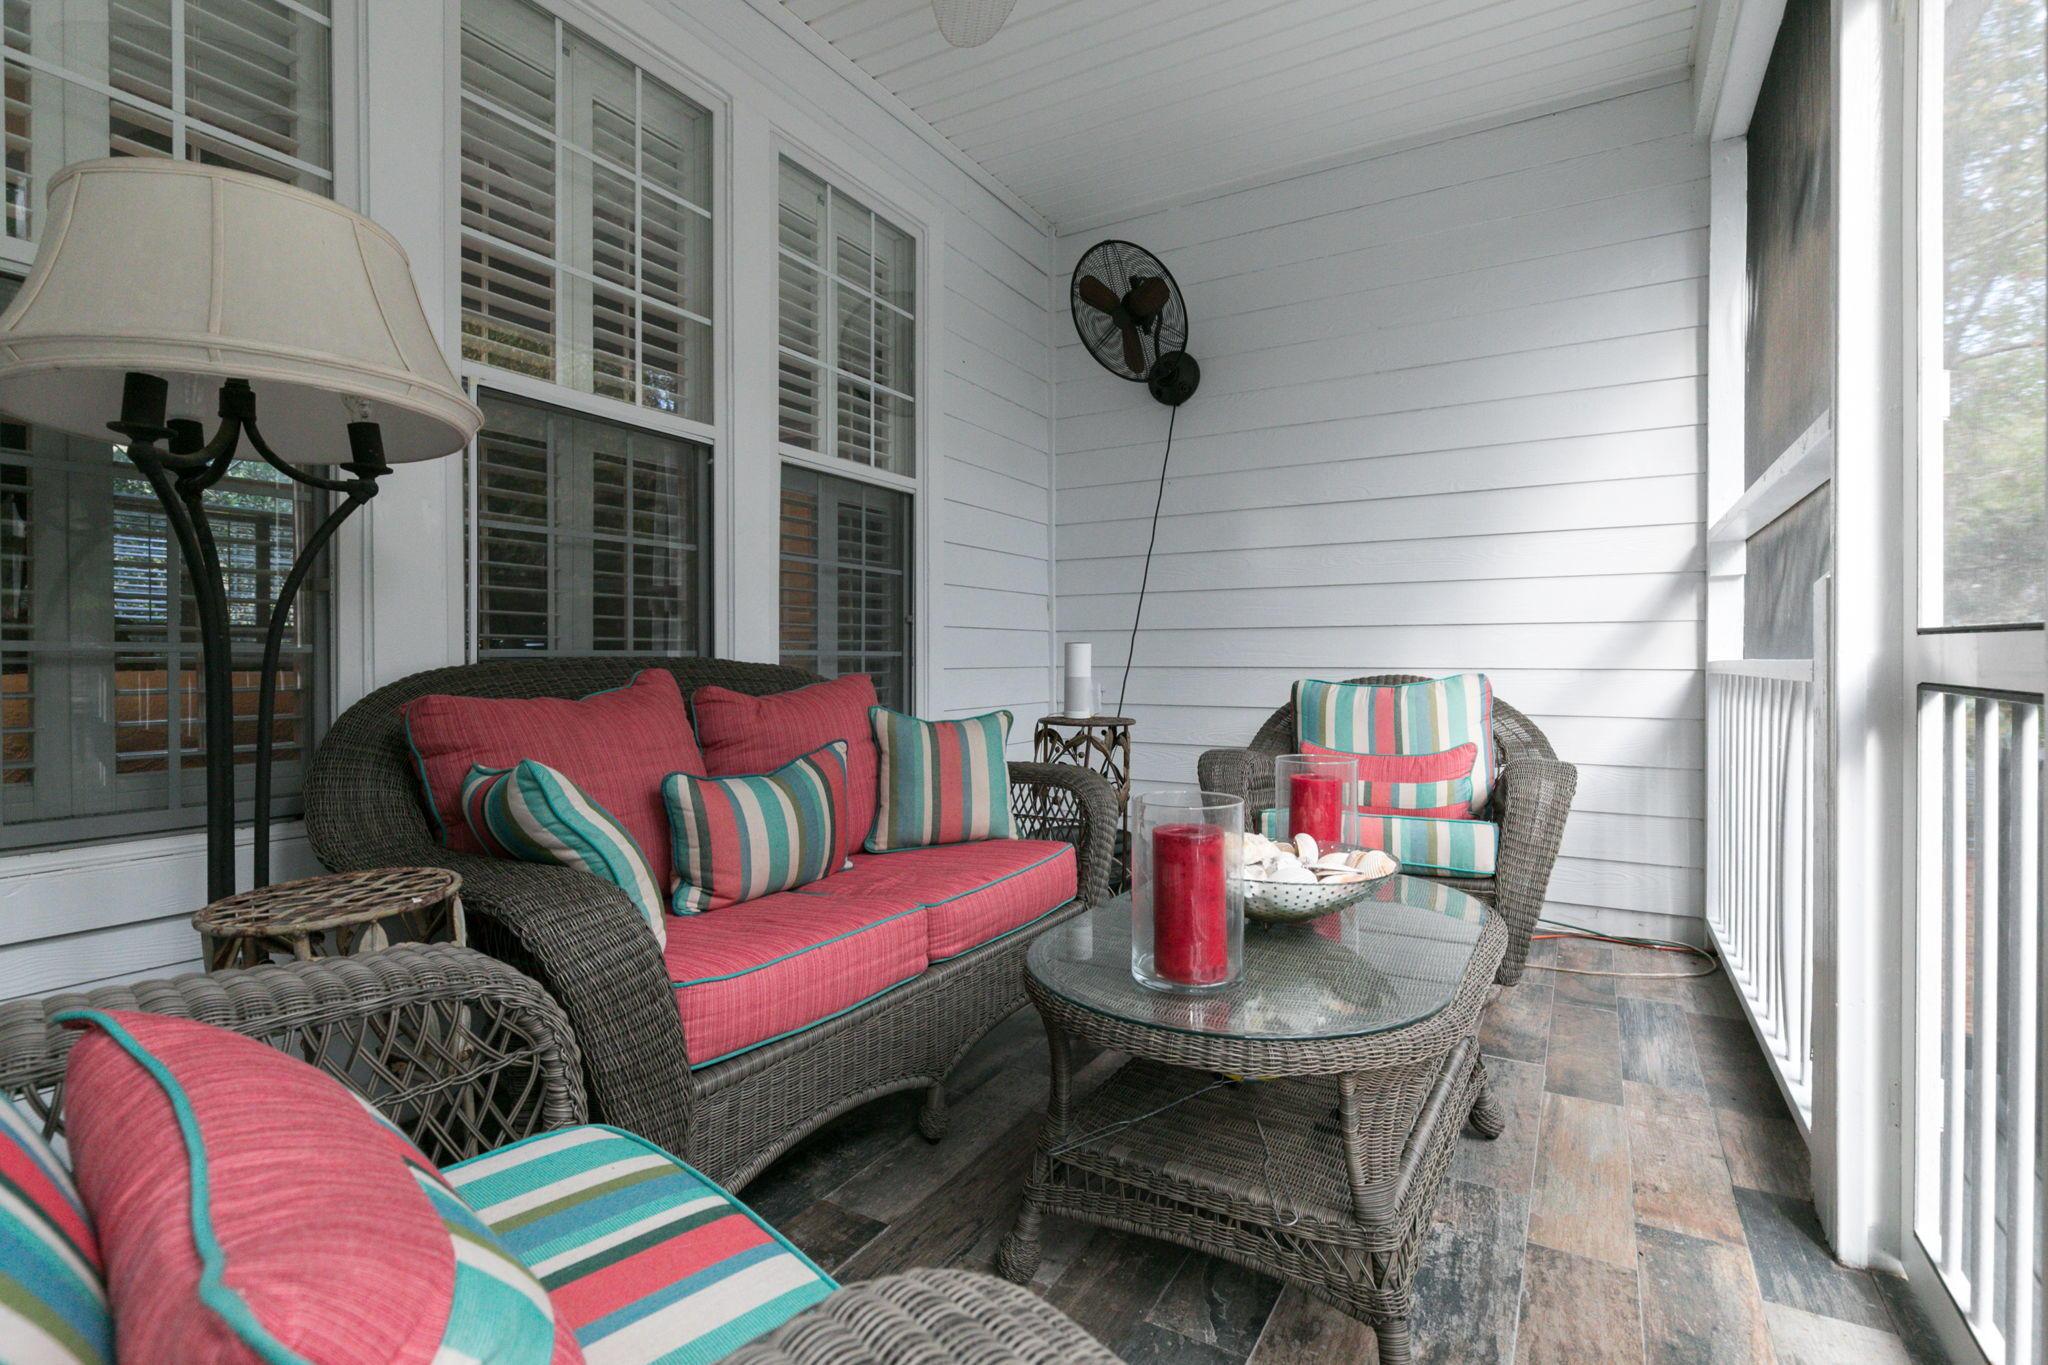 Dunes West Homes For Sale - 3625 Colonel Vanderhorst, Mount Pleasant, SC - 1